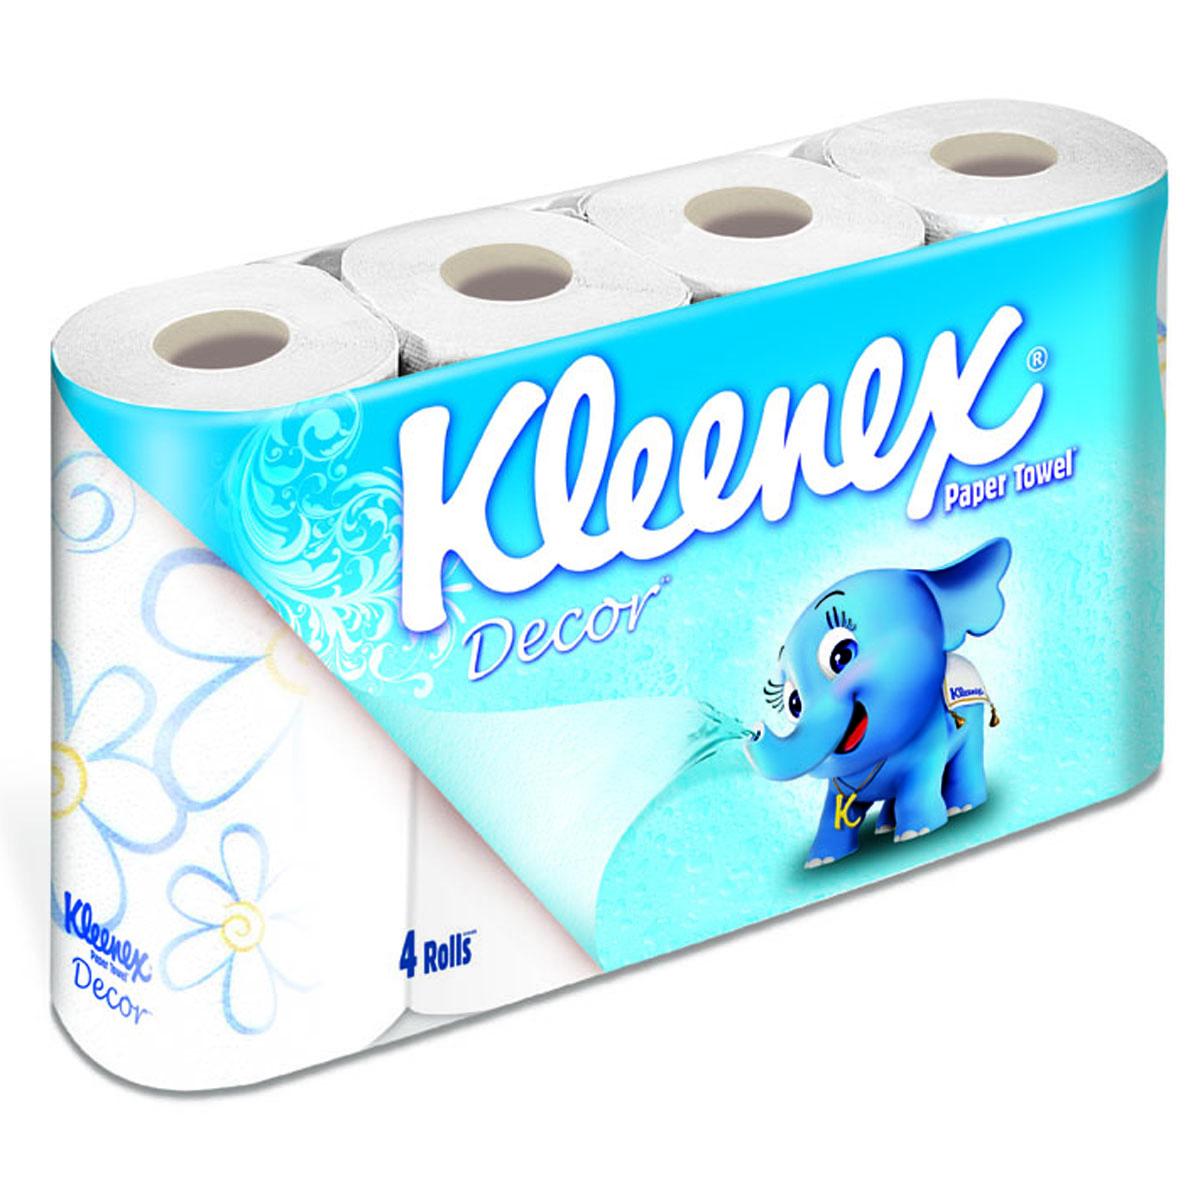 ��������� �������� Kleenex ����� (2 ����) 4 ��